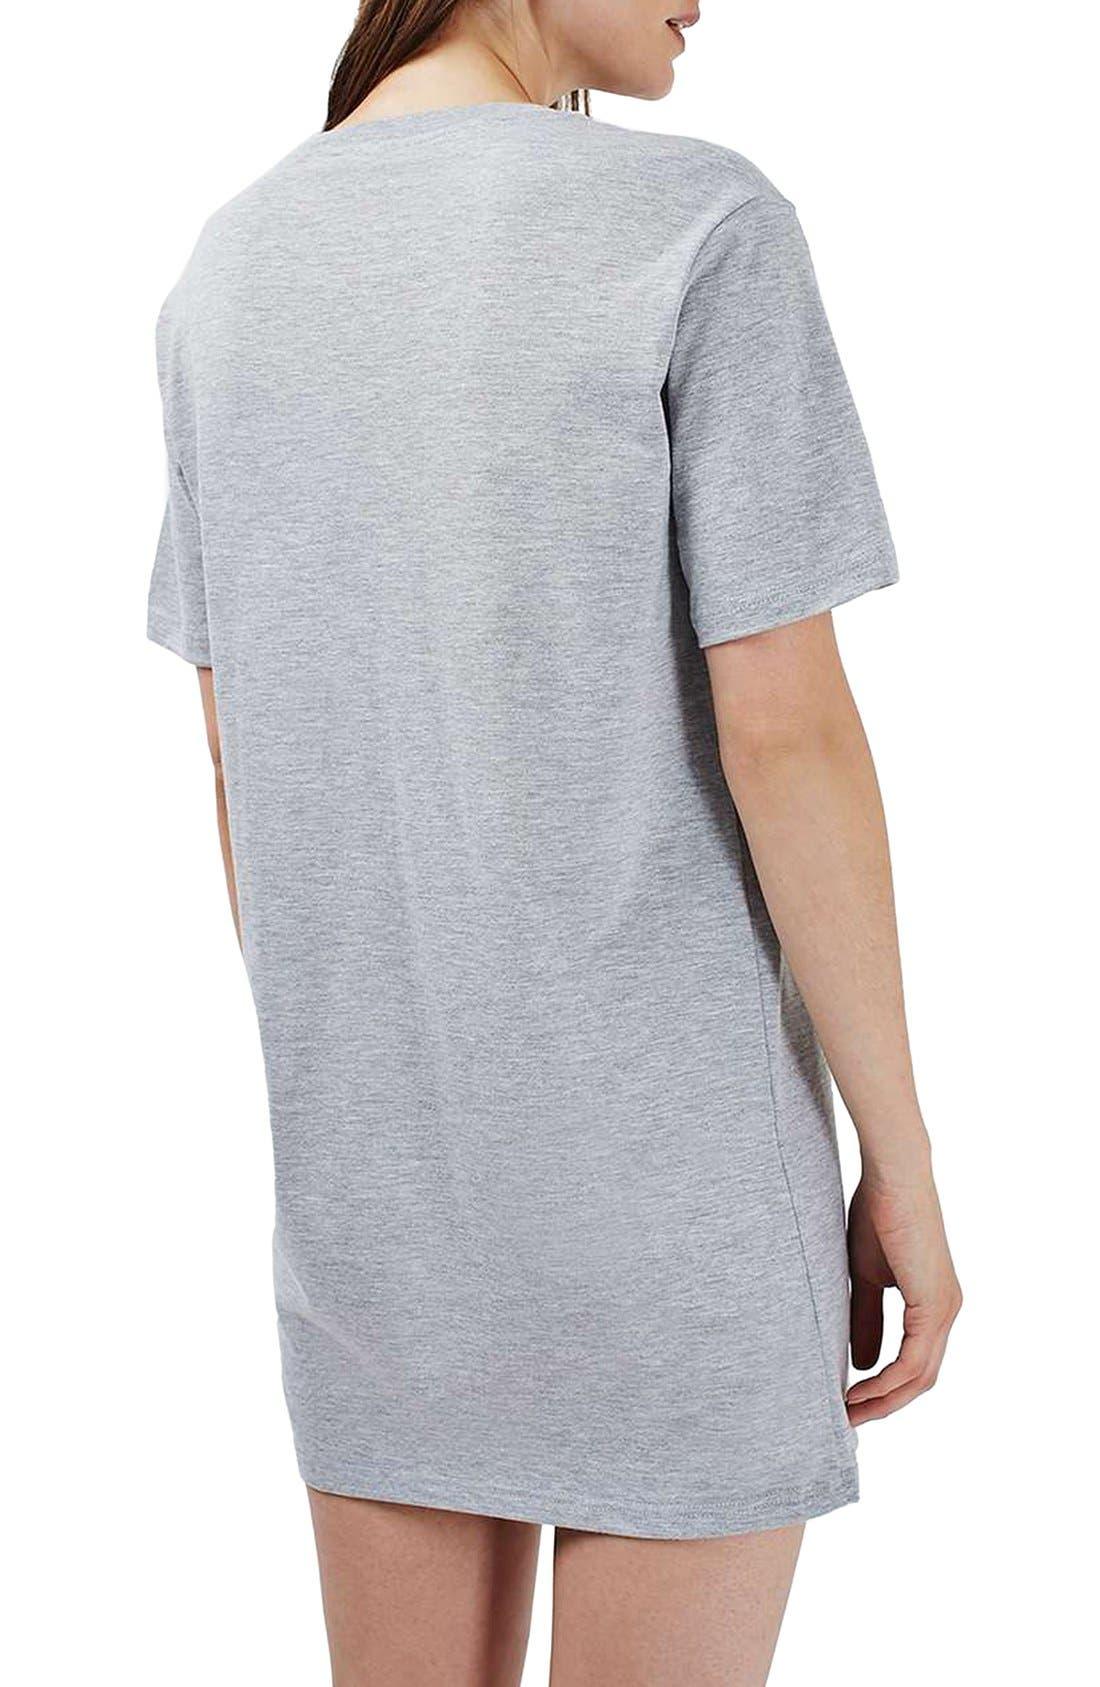 Alternate Image 3  - Topshop Nachos and Chill Sleep Shirt